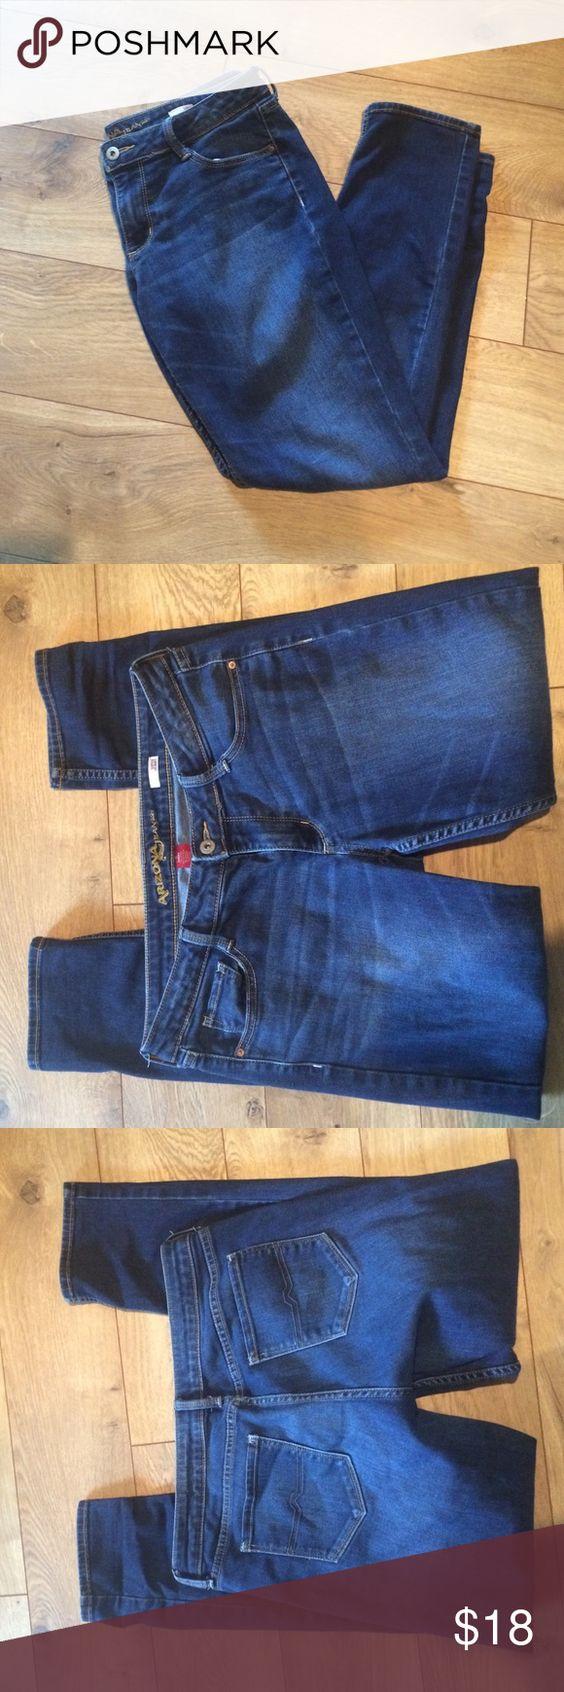 Arizona jeans super skinny Size 11 short 78%cotton 20%polyster and 2 % spandex Arizona Jean Company Pants Skinny